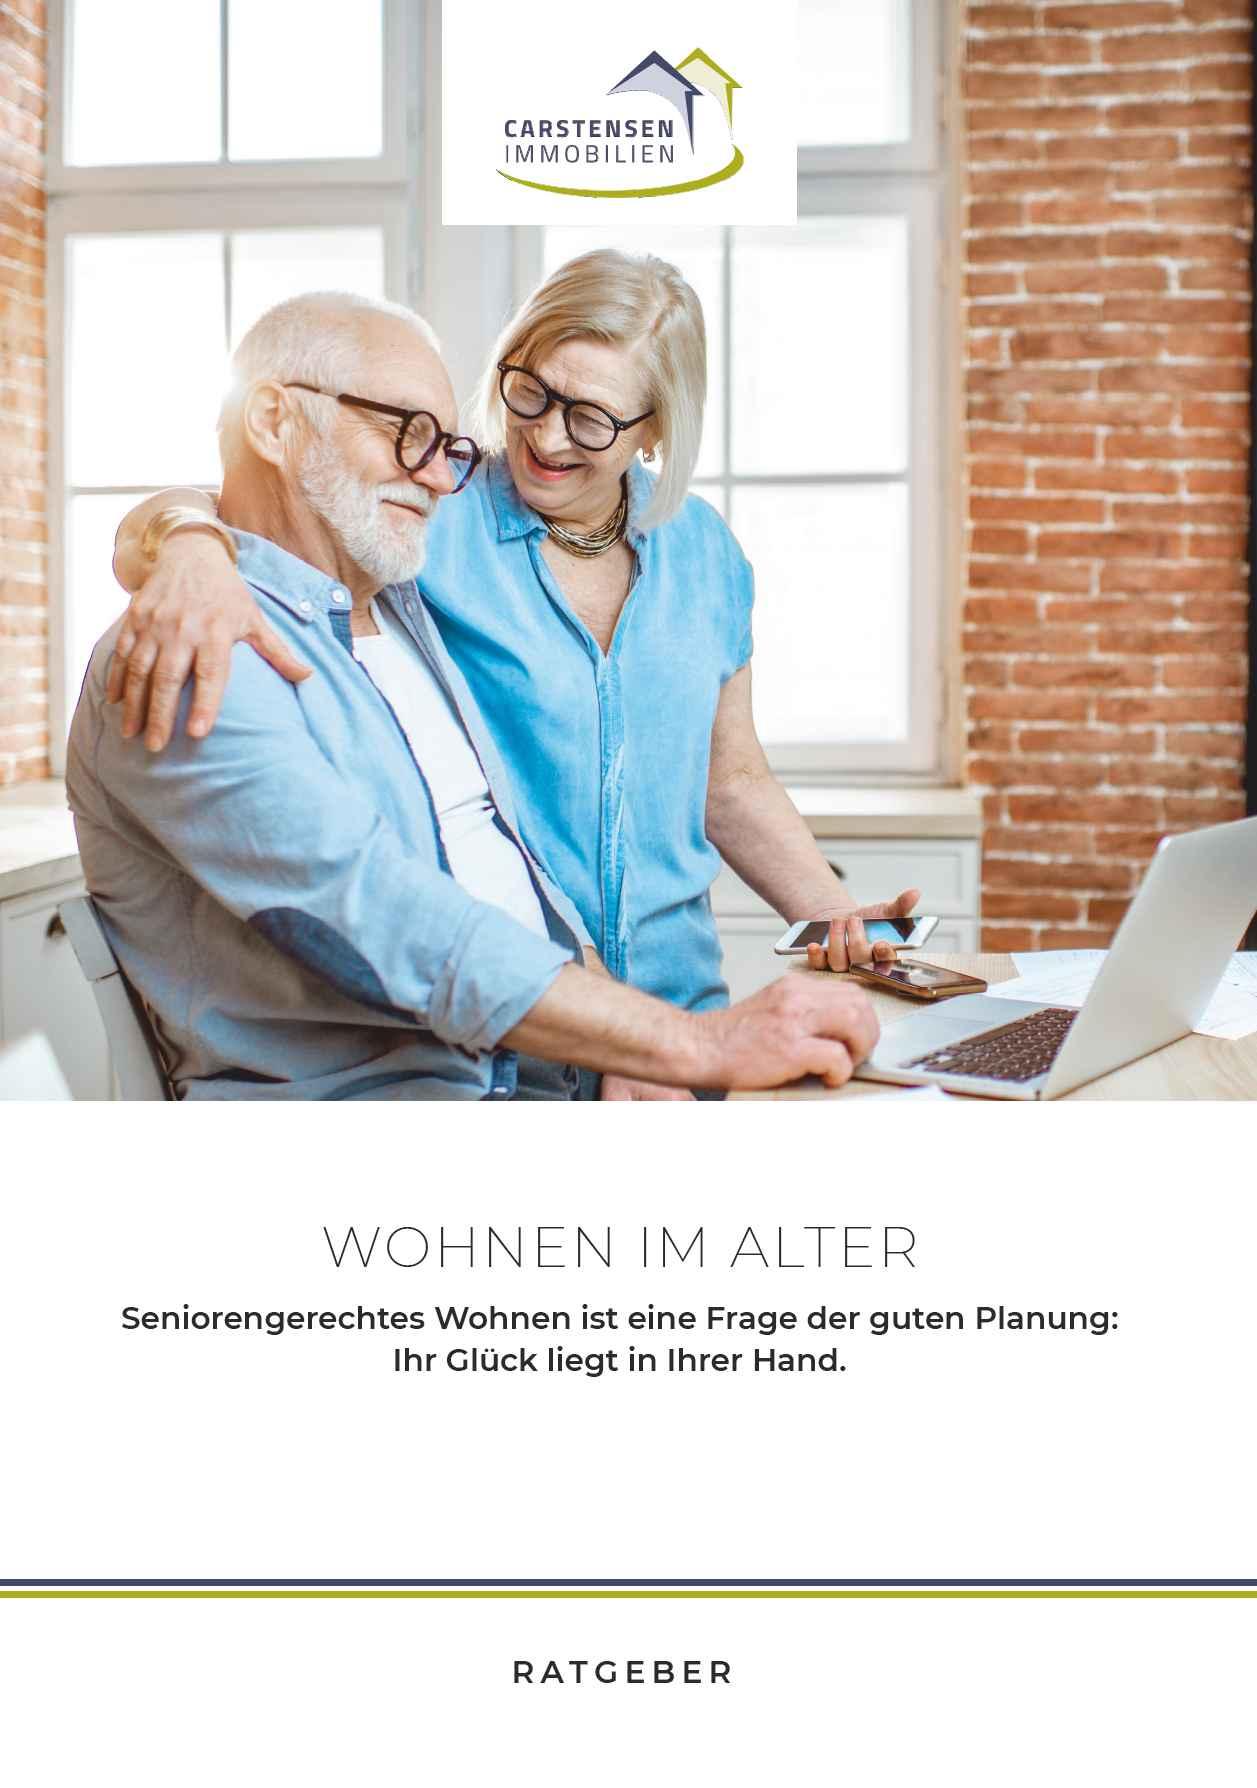 Ratgeber Immobilie im Alter